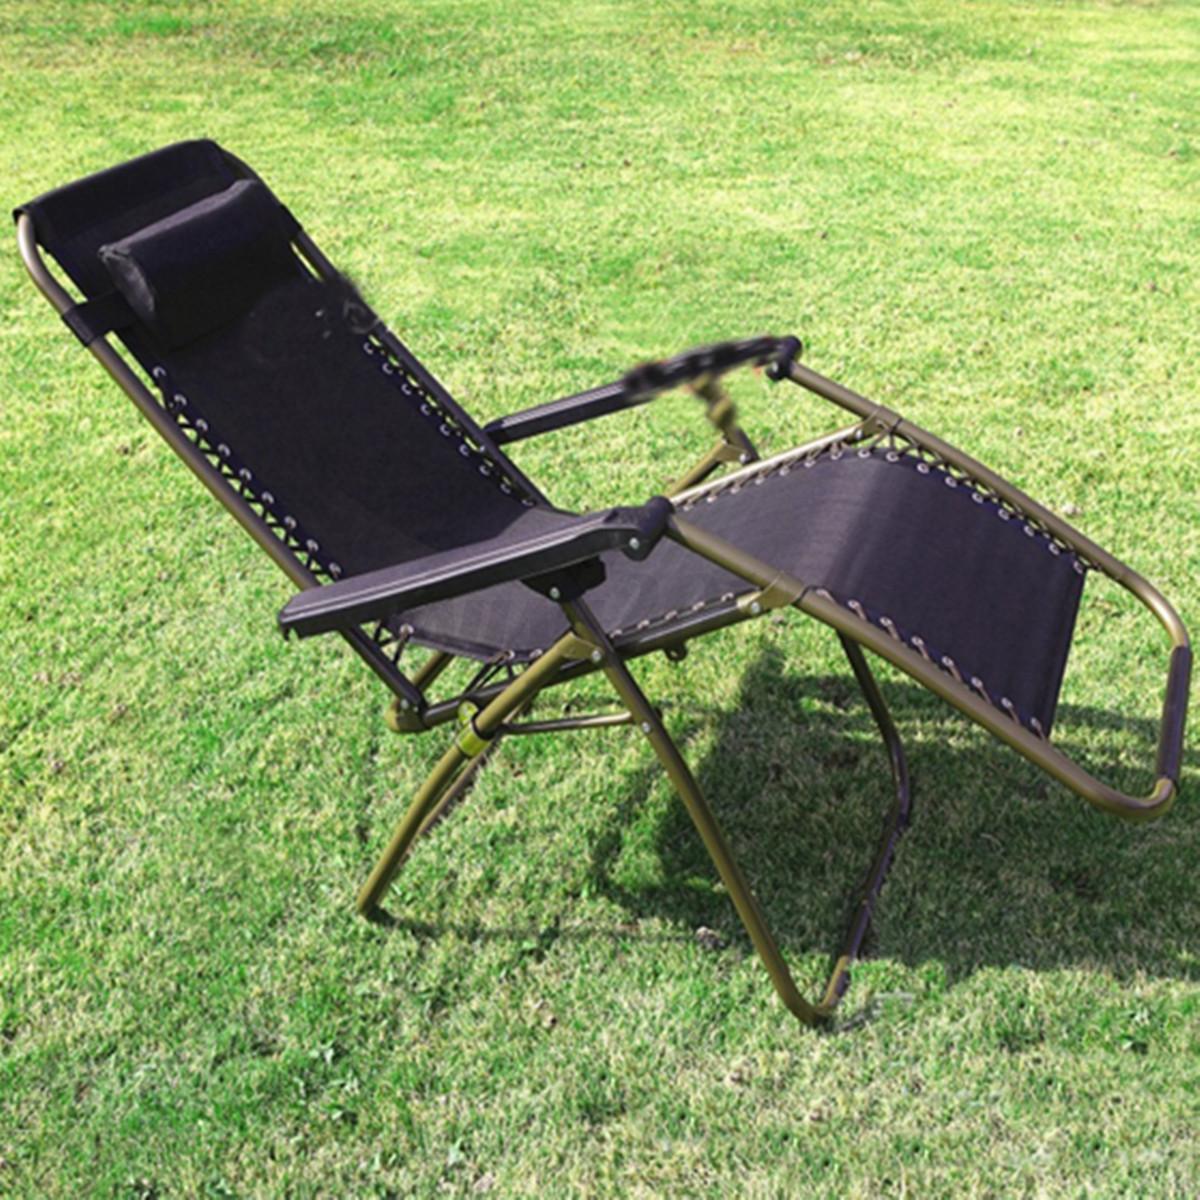 Chaise longue de jardin fauteuil transat pliante terrasse balcon plage si ge uk ebay - Chaise longue balcon ...